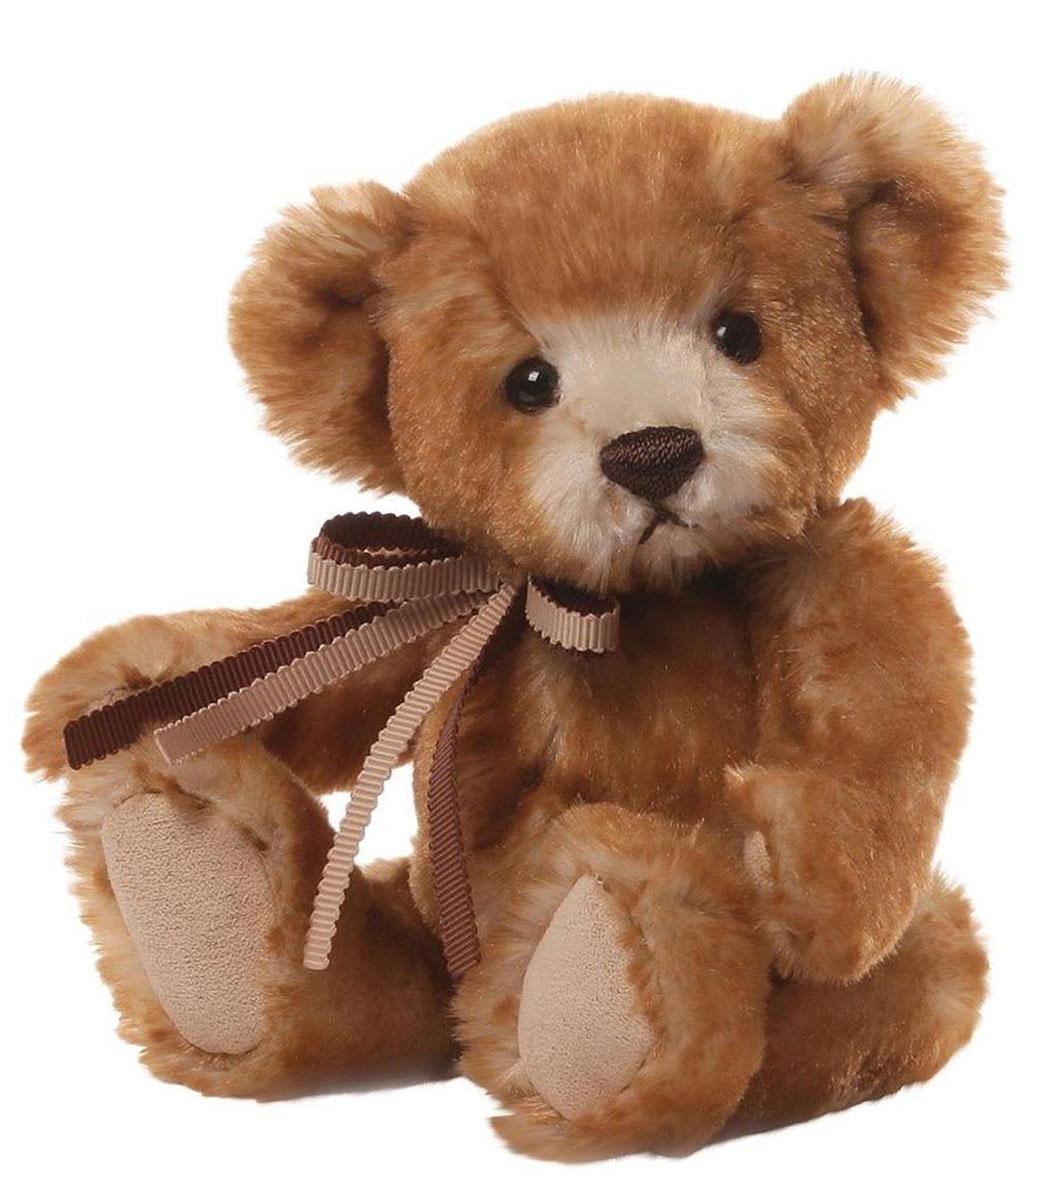 Gund Мягкая игрушка Arlo Bear 18 см gund мягкая игрушка arlo bear 18 см